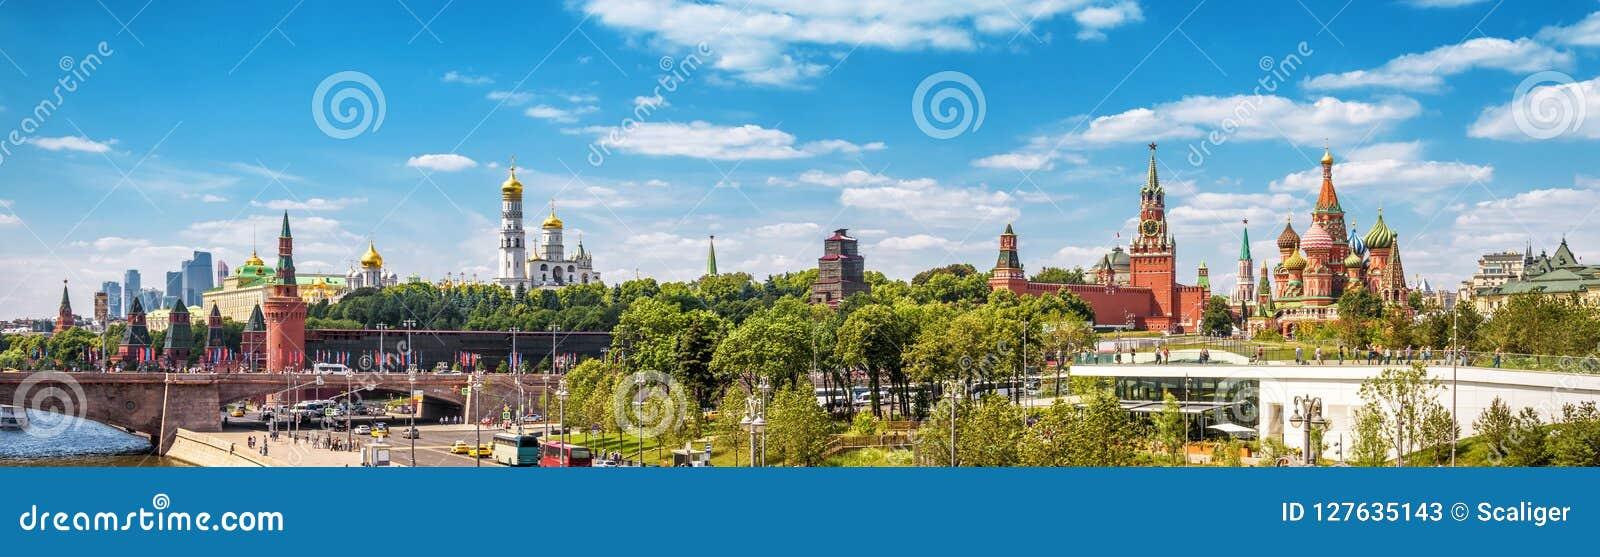 Belle vue panoramique de Moscou Kremlin, Russie